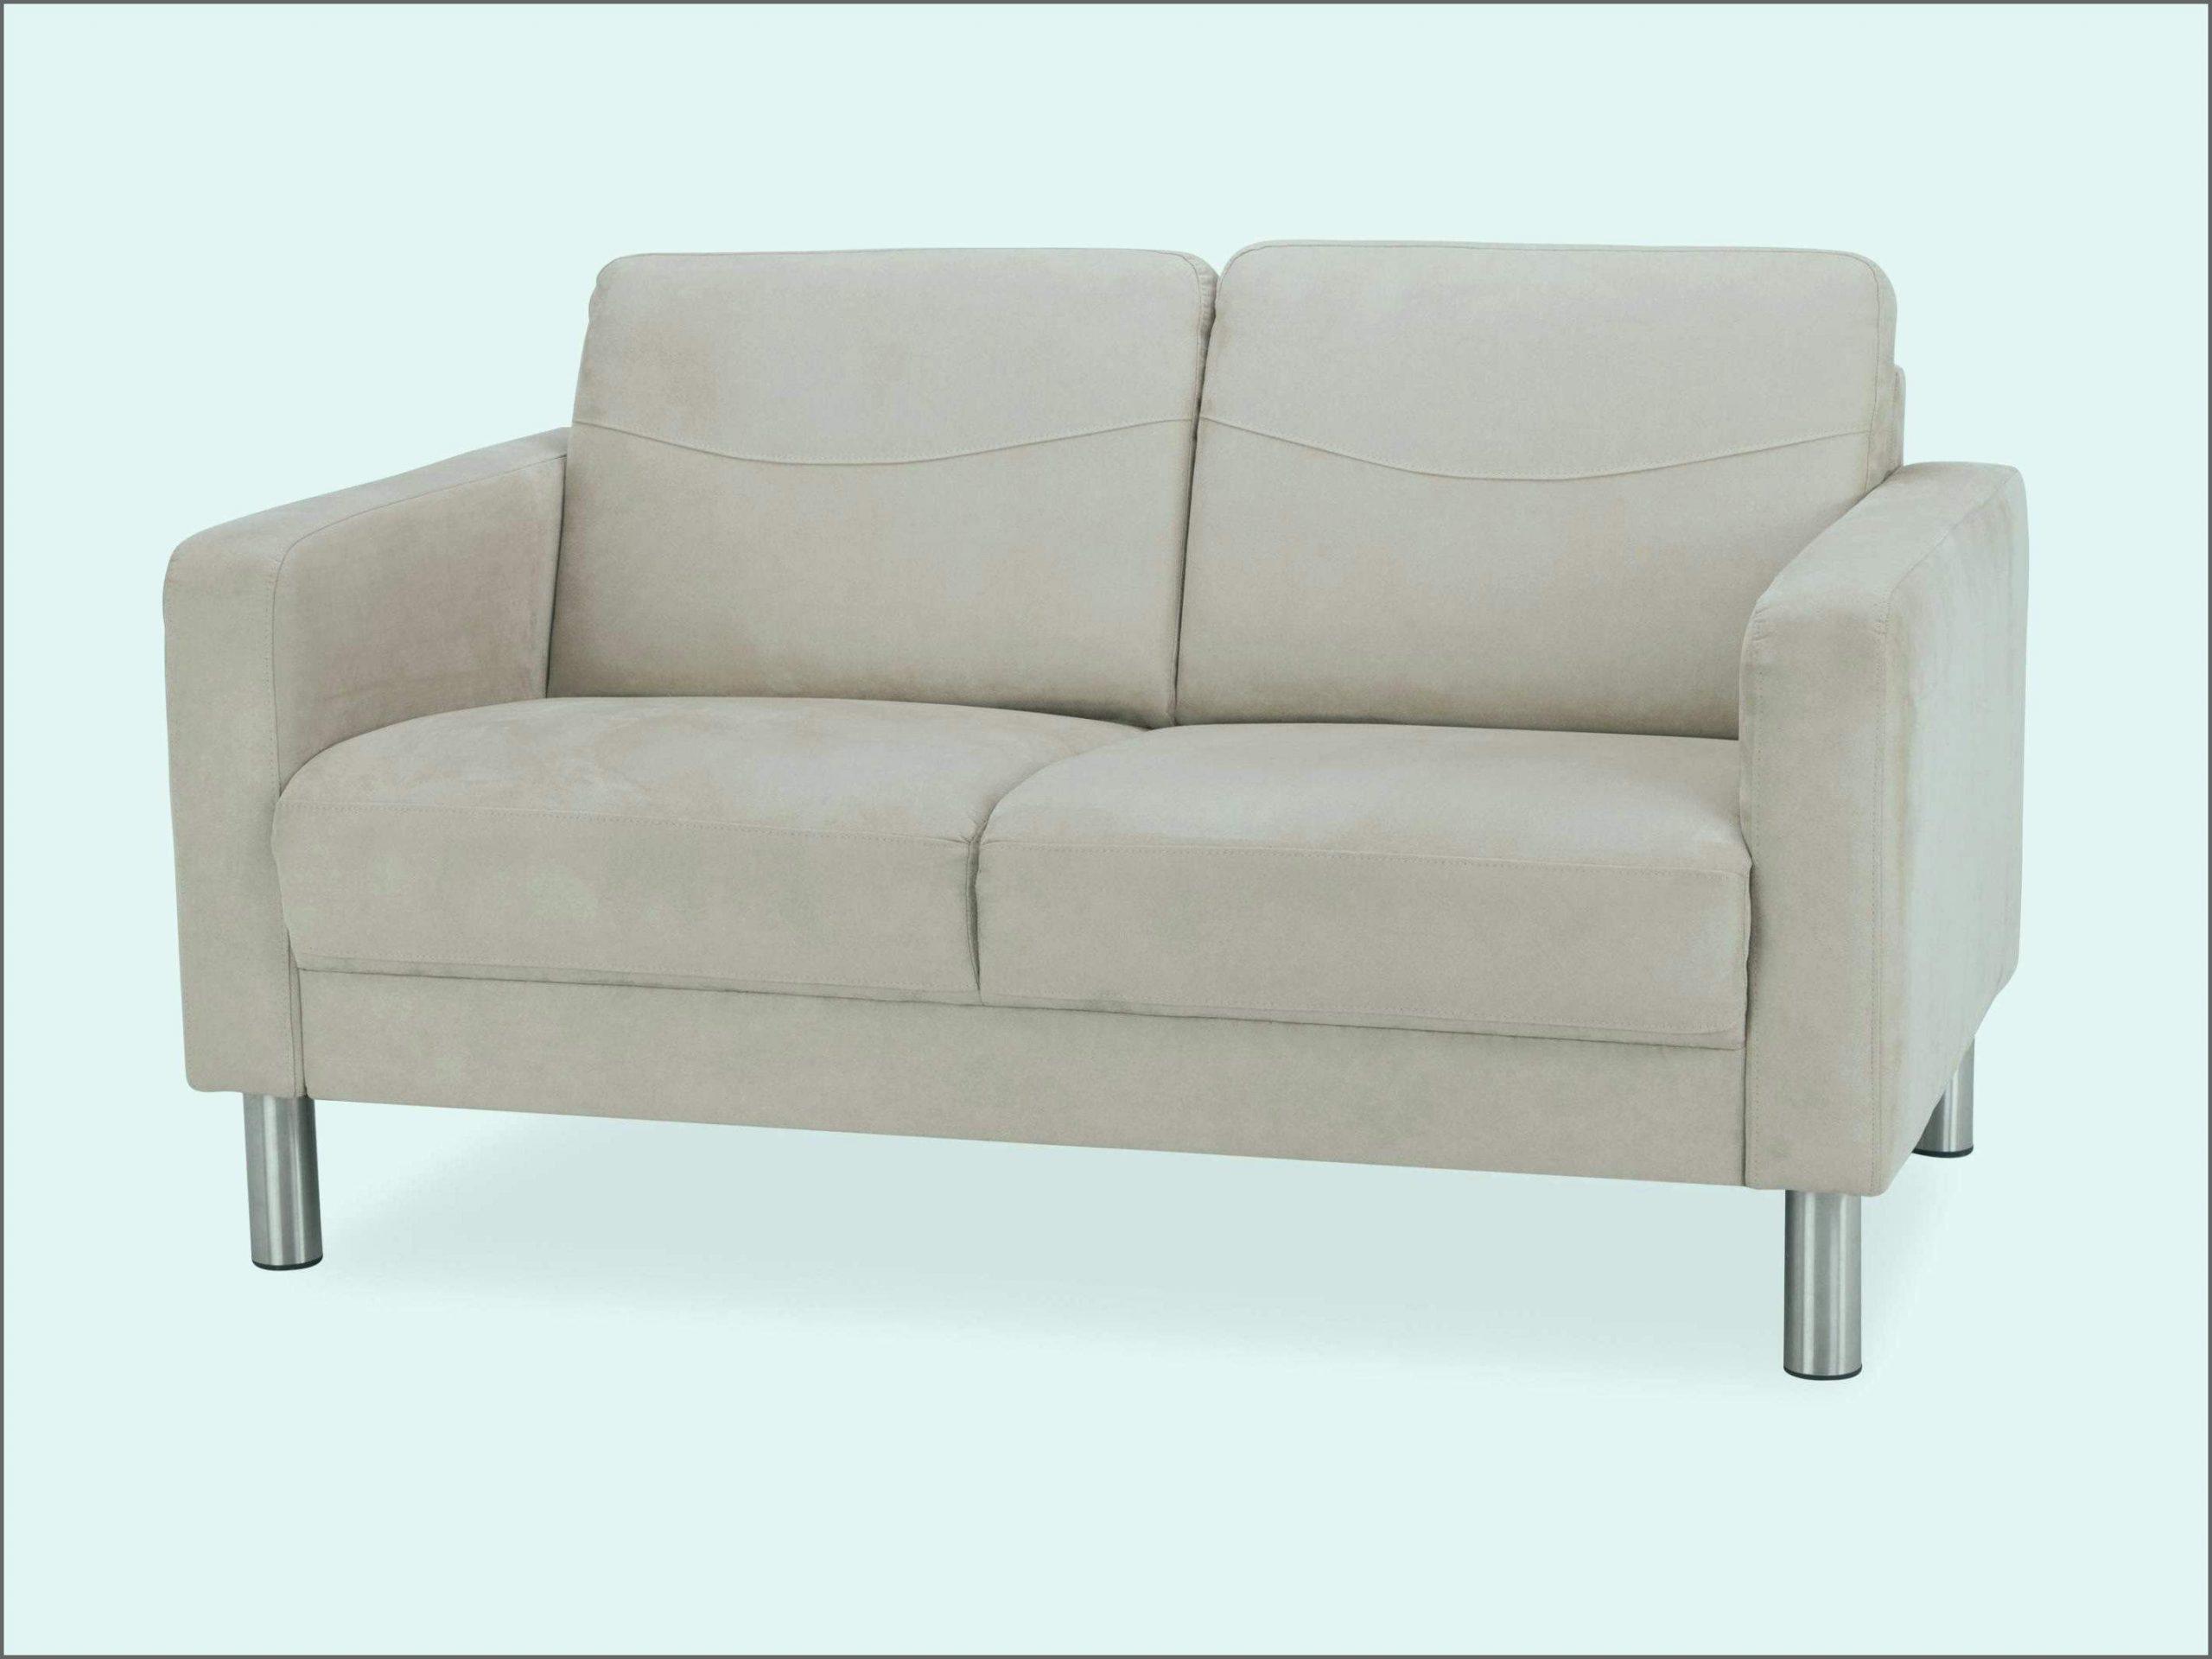 Full Size of Wohnzimmer Sessel Reizend 31 Fantastisch Und Frisch Lounge Sessel Wohnzimmer Wohnzimmer Wohnzimmer Sessel